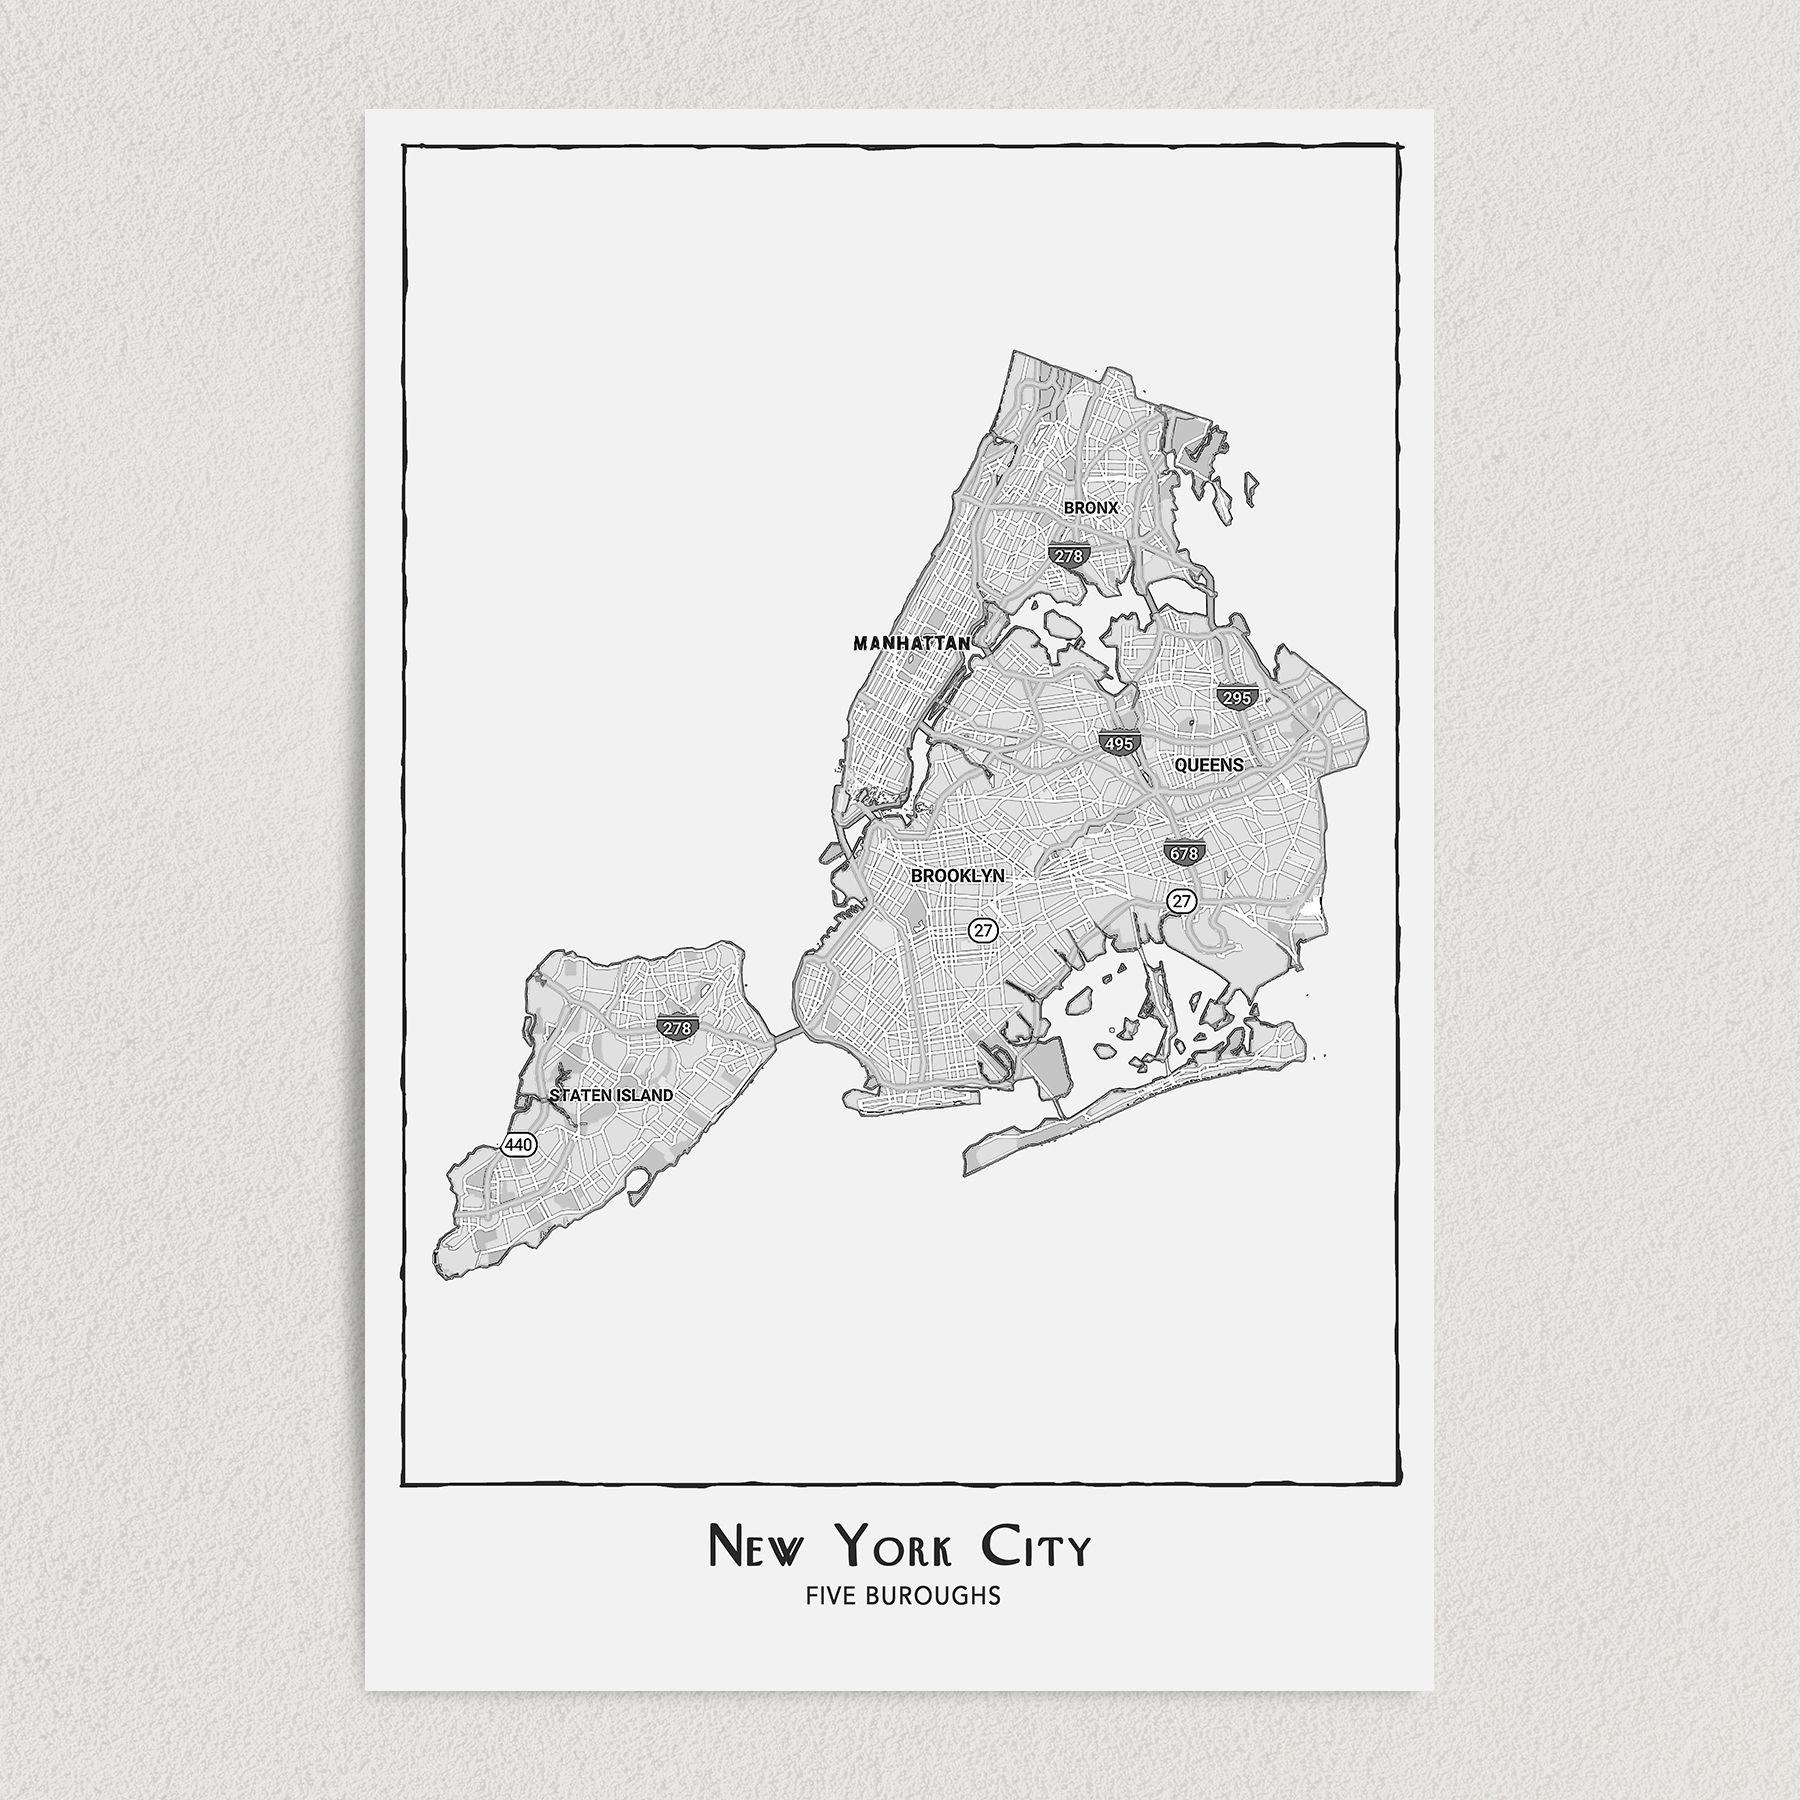 New York City Five Boroughs Art Print Poster 12″ x 18″ Wall Art T1000